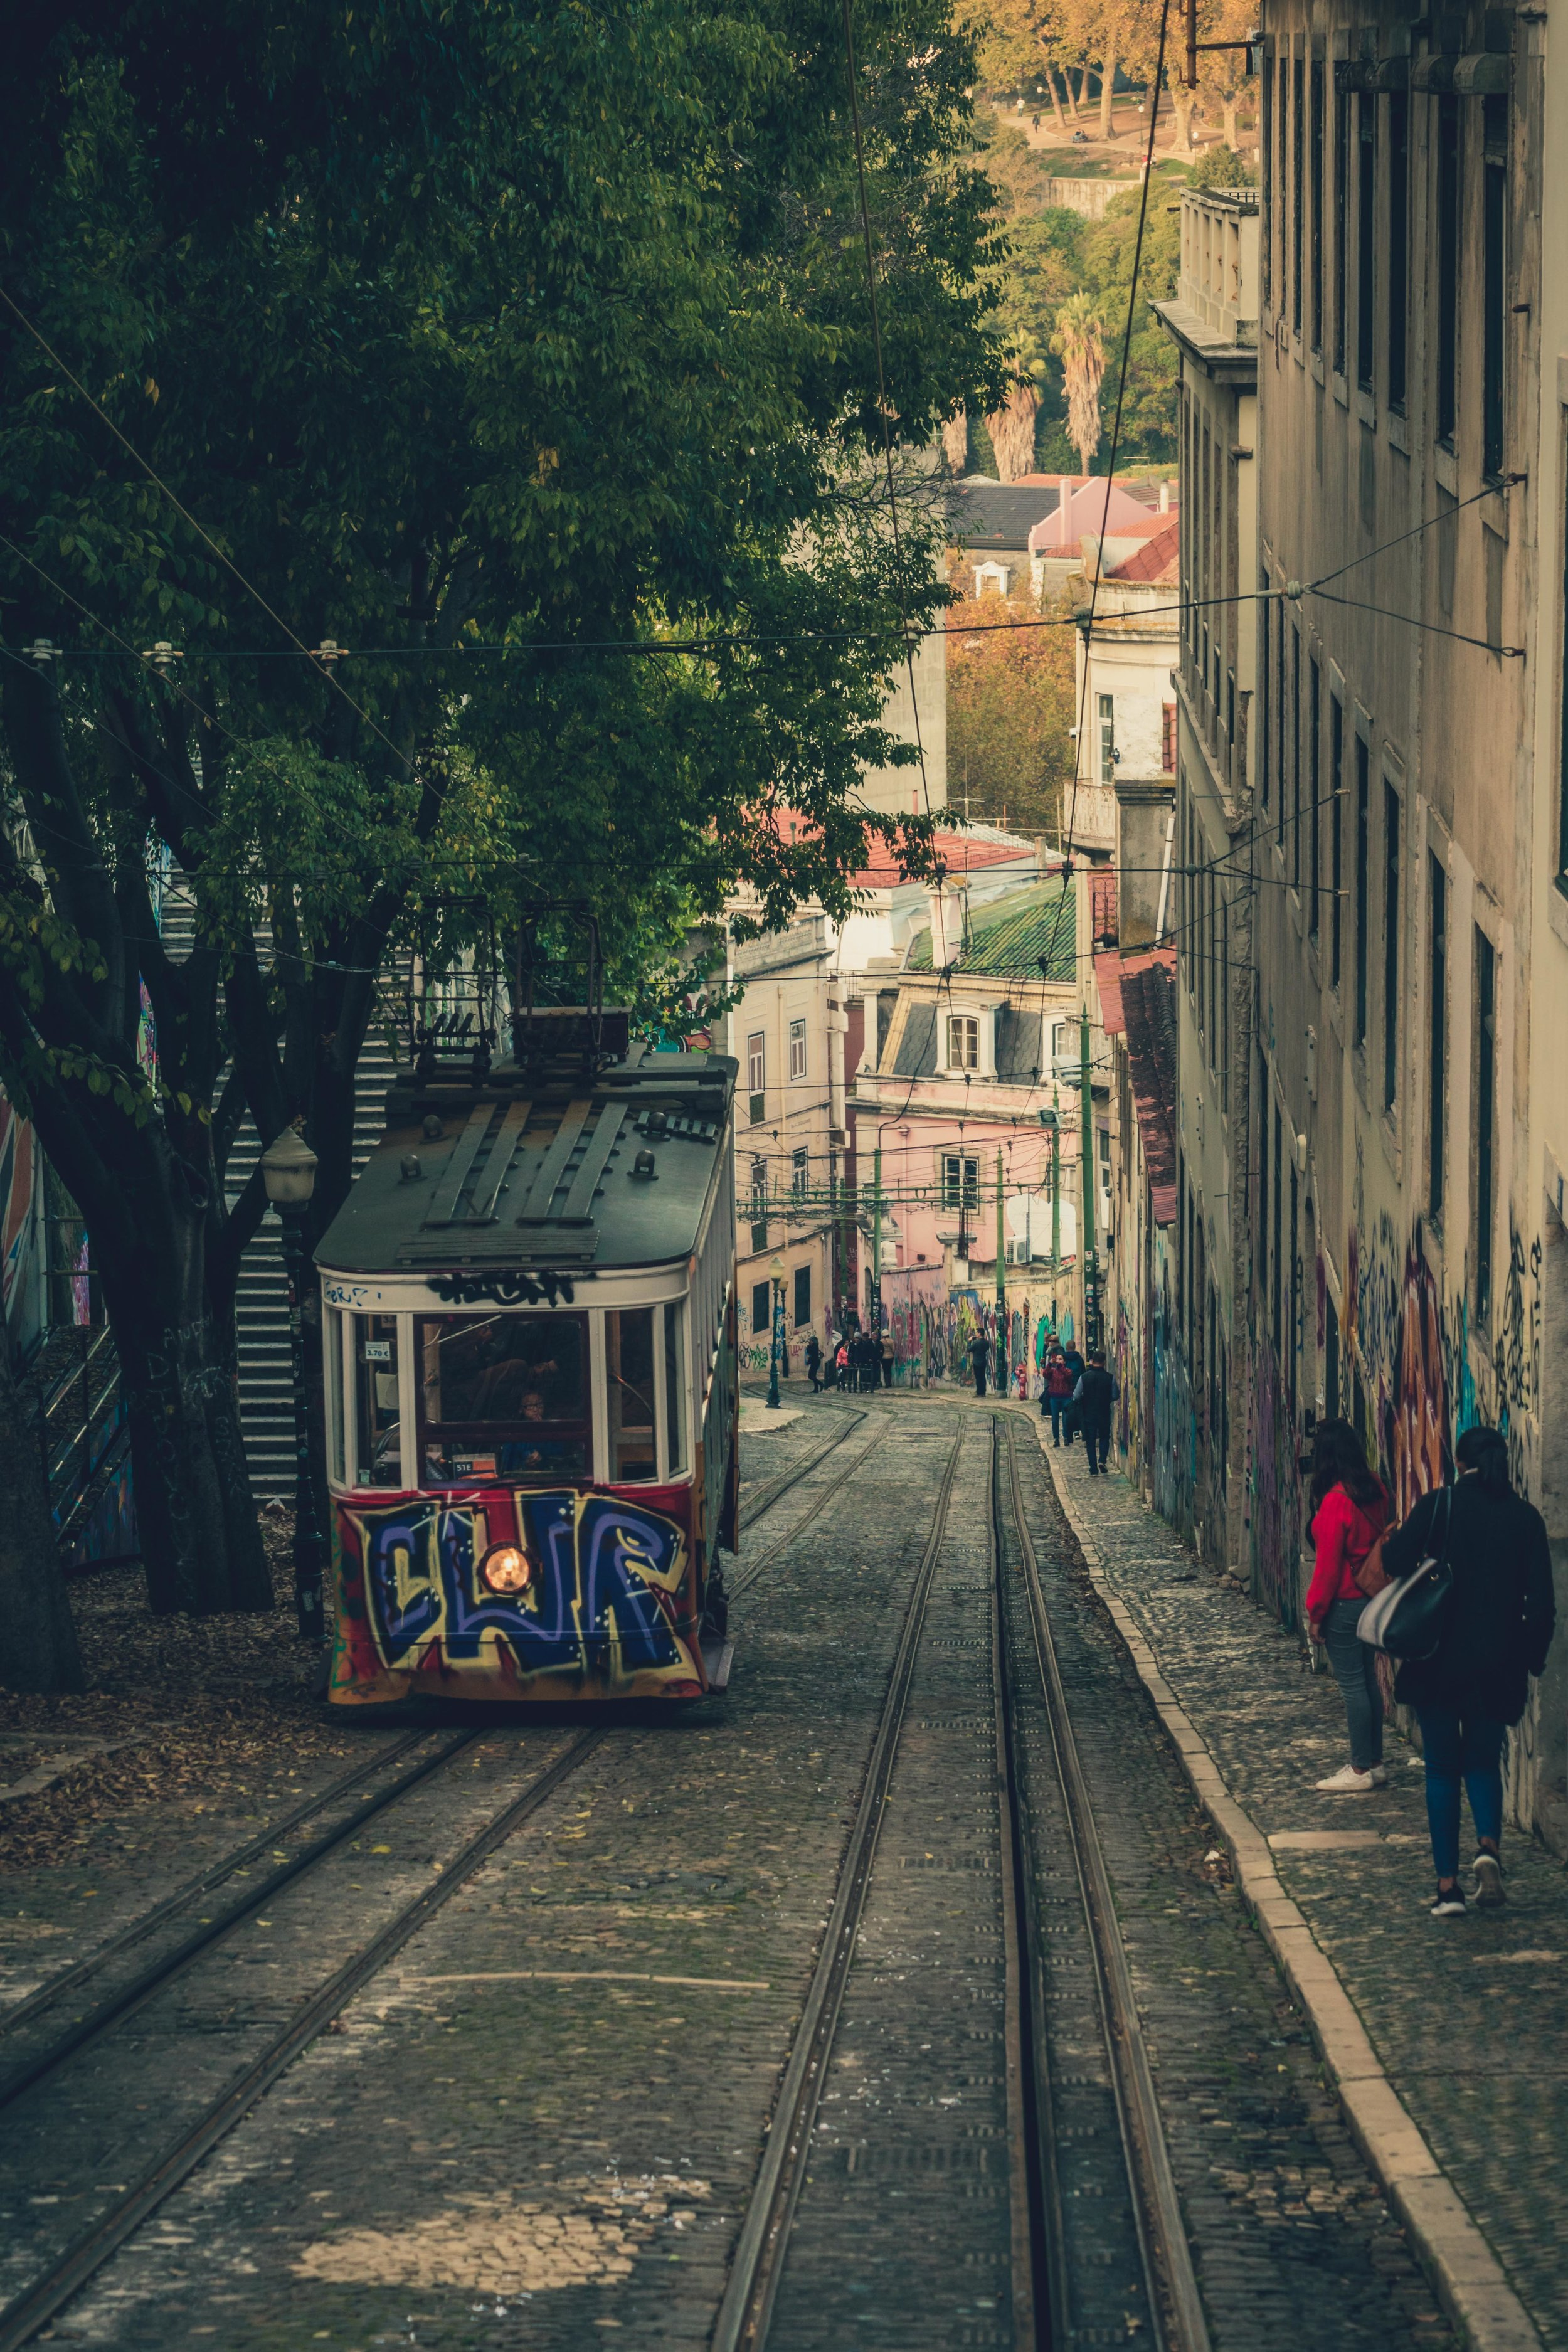 Old Tram Lisbon Portugal.jpg